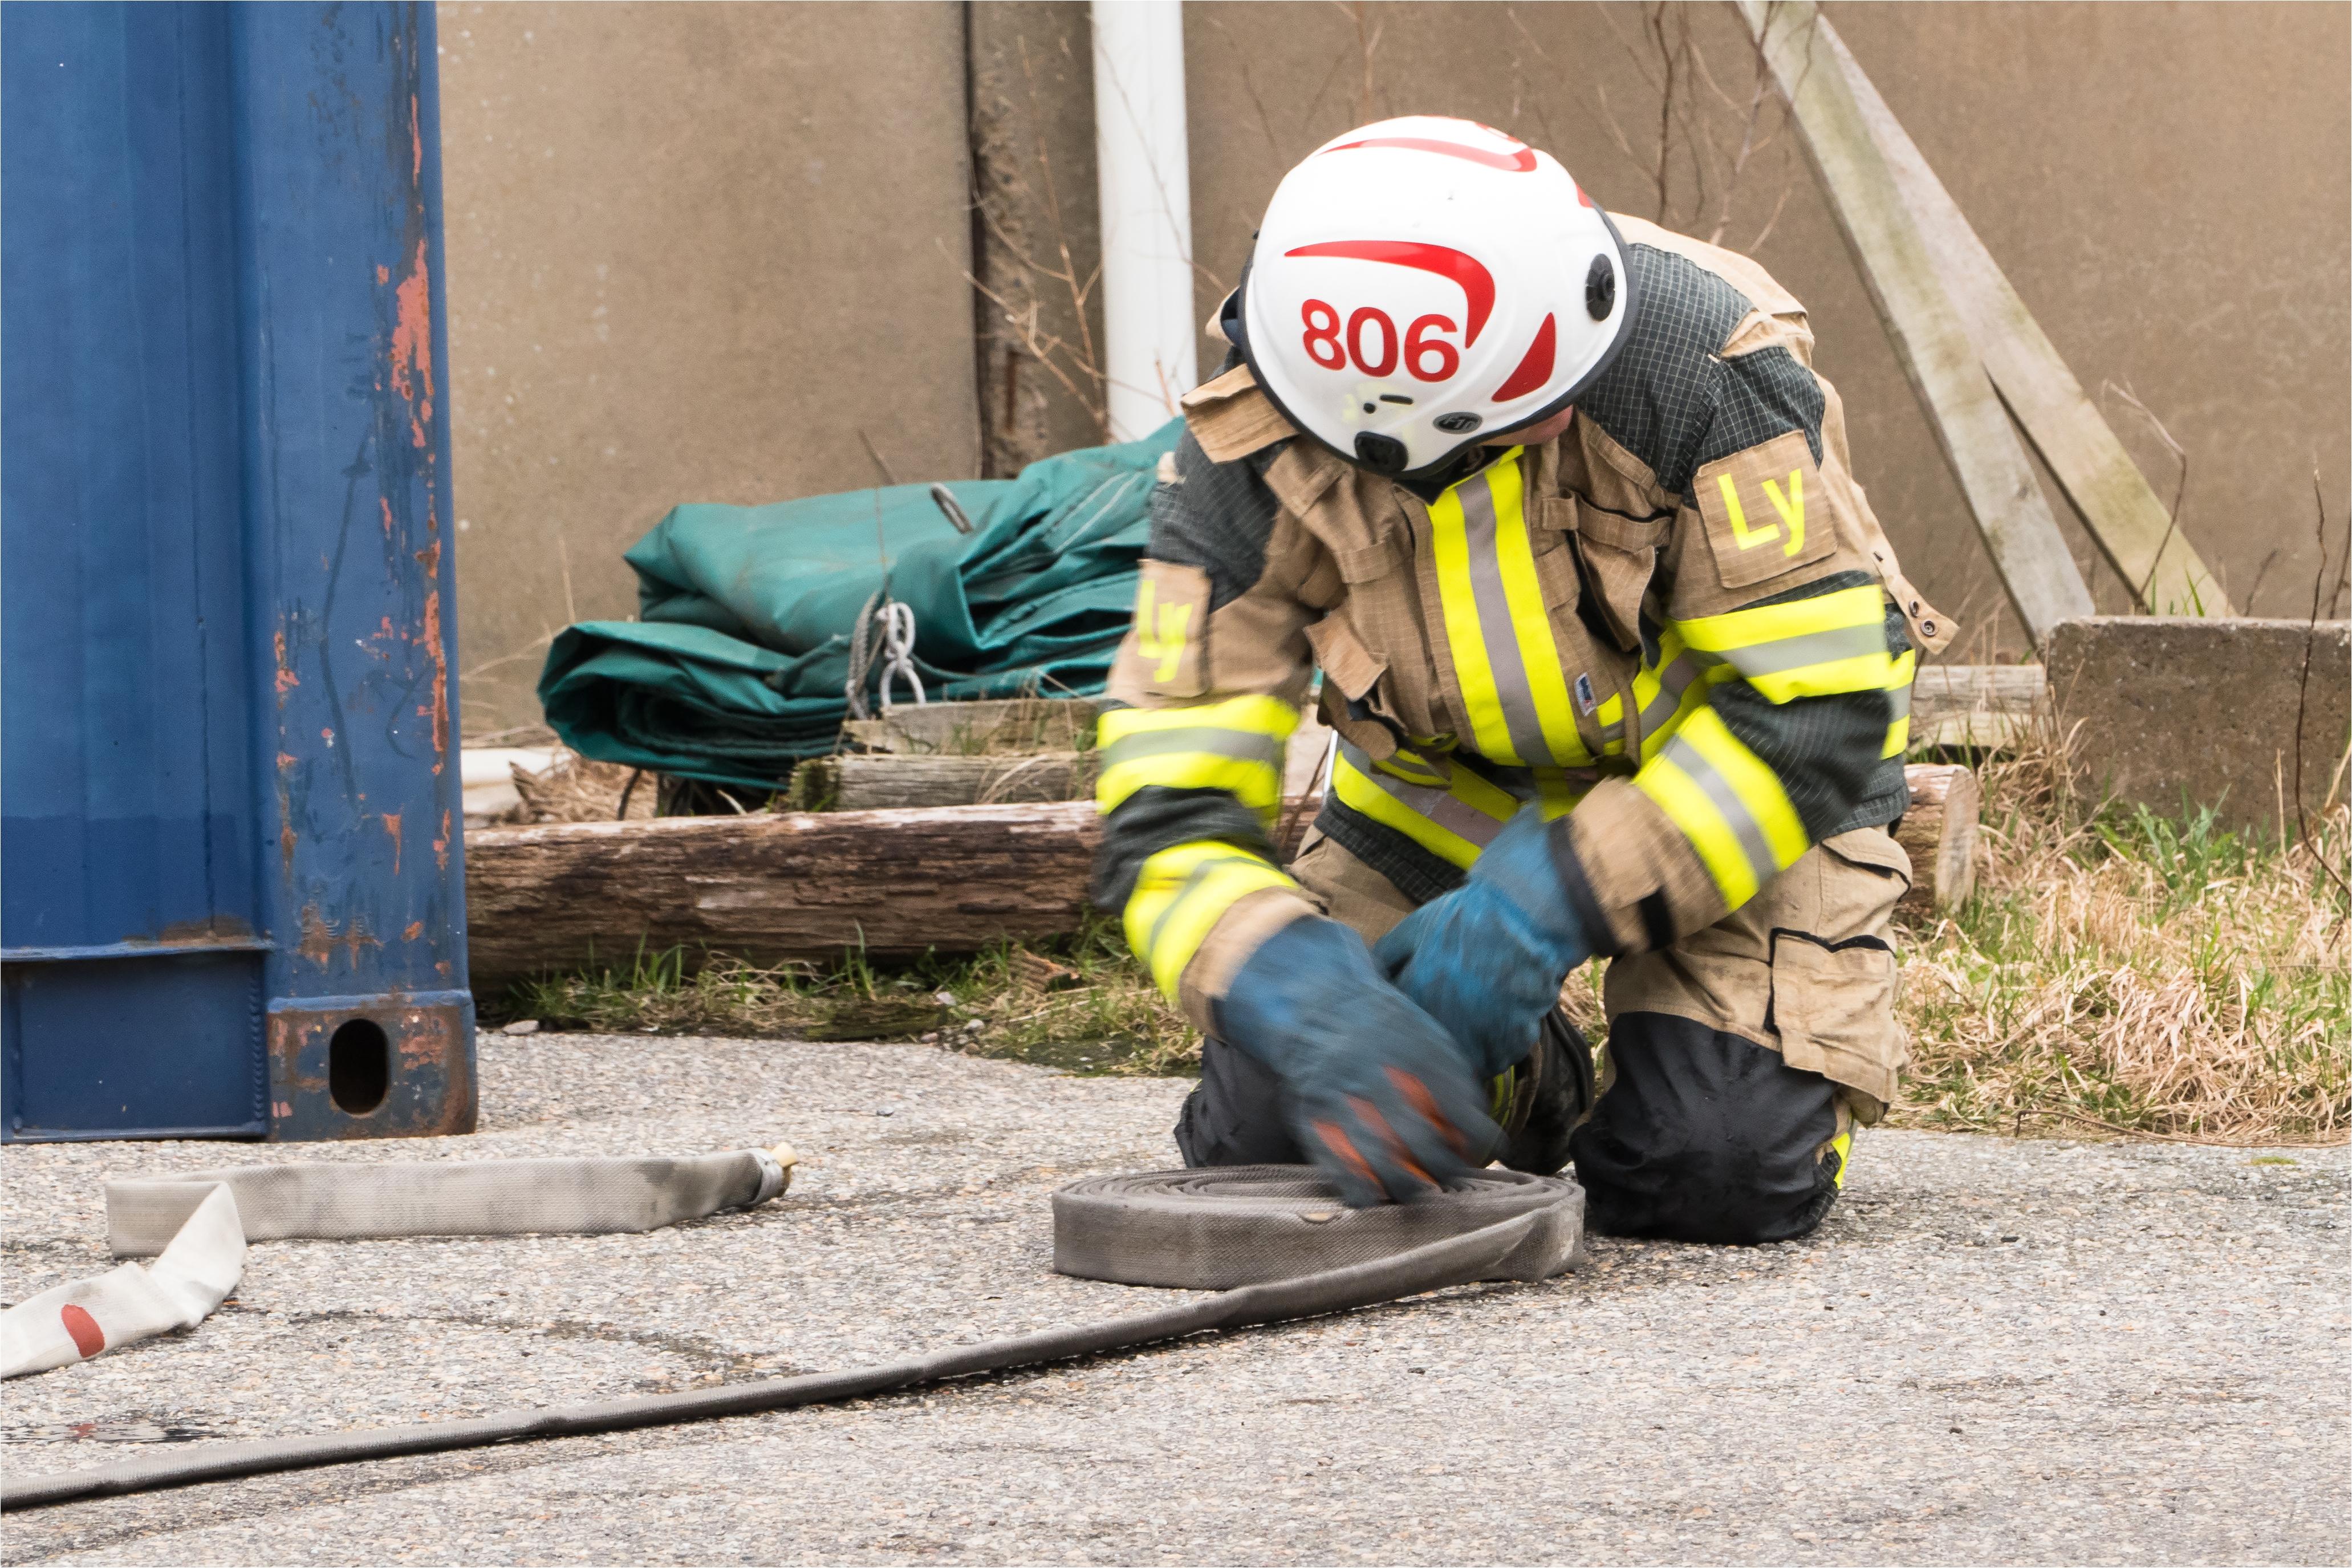 filepreemraff firefighters training in gra¶ta¶ industrial area 6